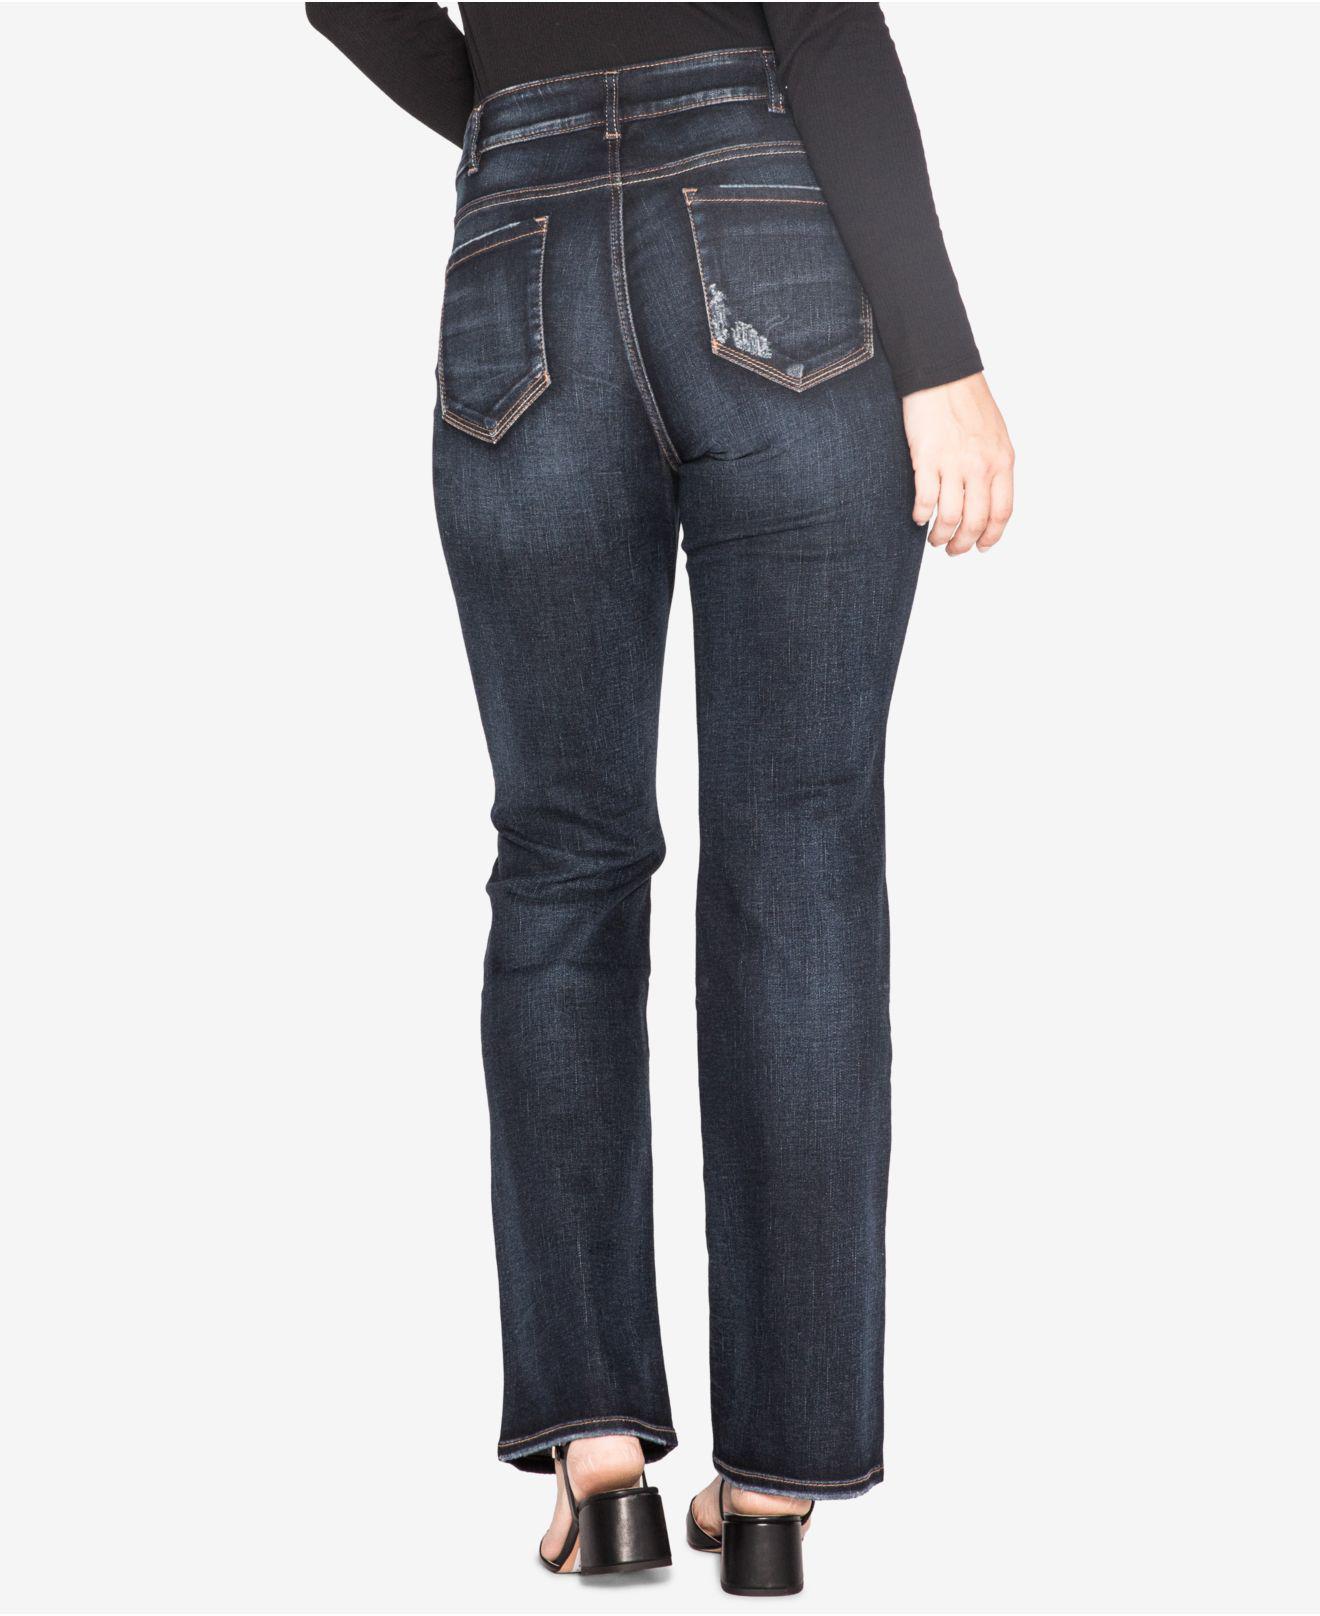 a960deef84f Lyst - Silver Jeans Co. Trendy Plus Size Elyse Slim Bootcut Jeans ...